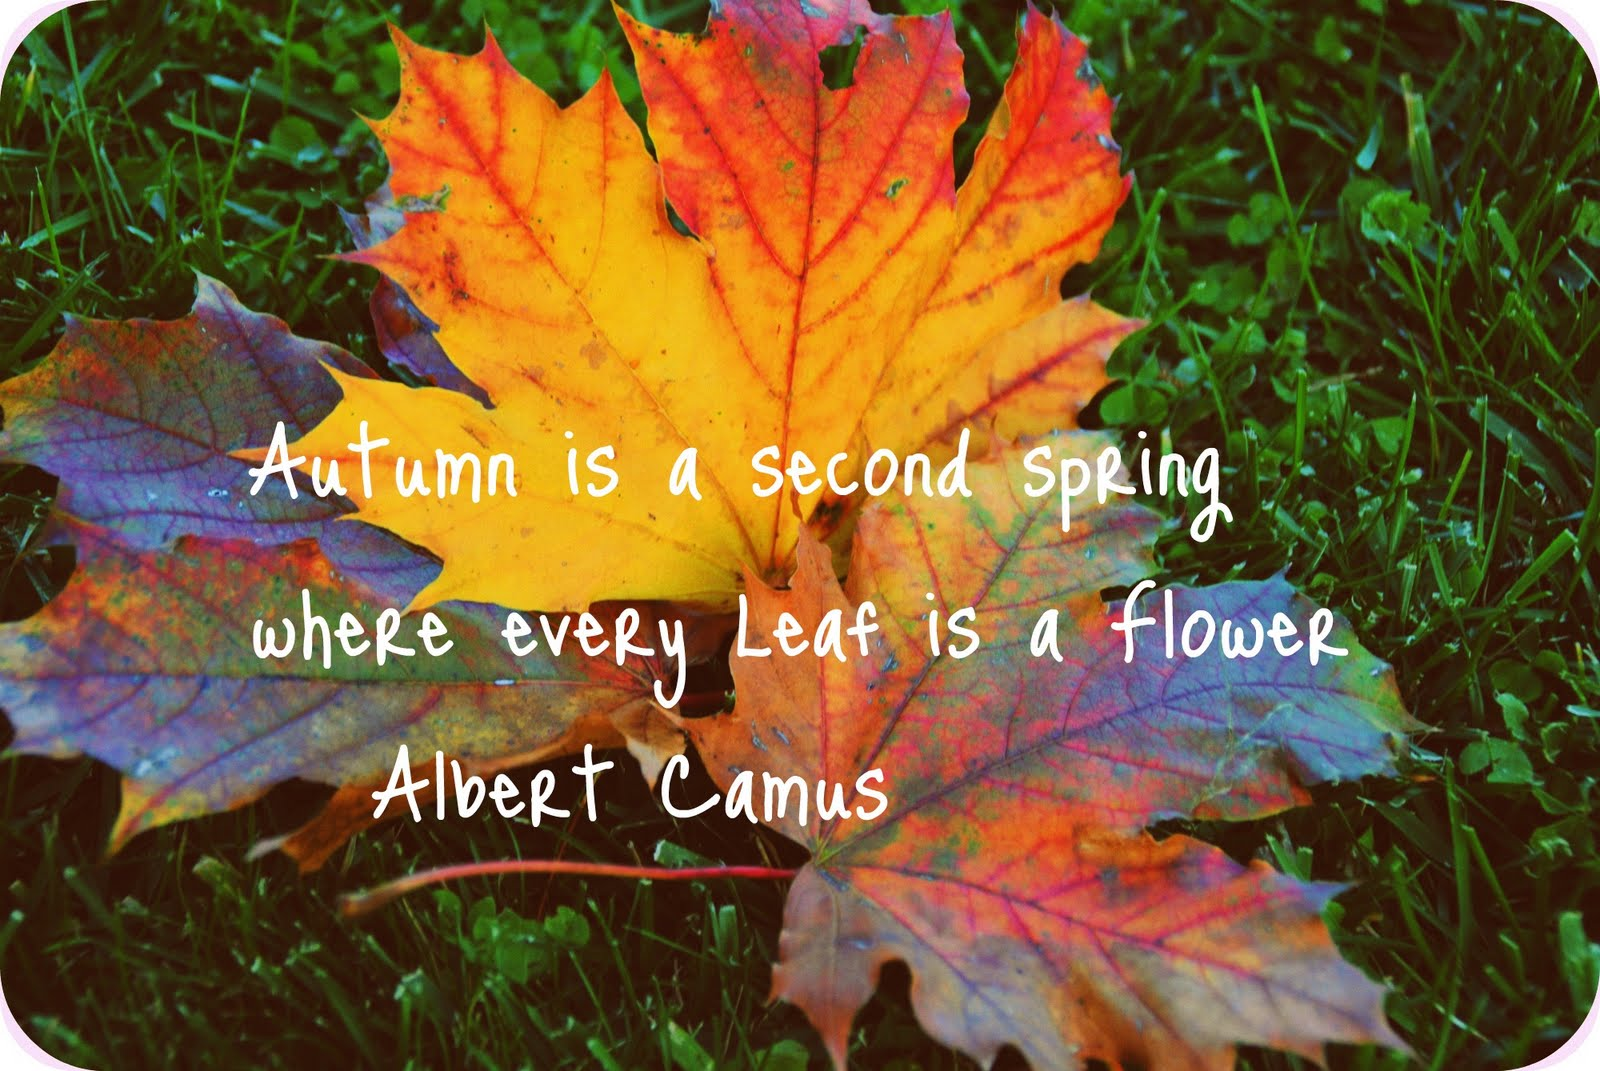 October Fall Quotes Quotesgram